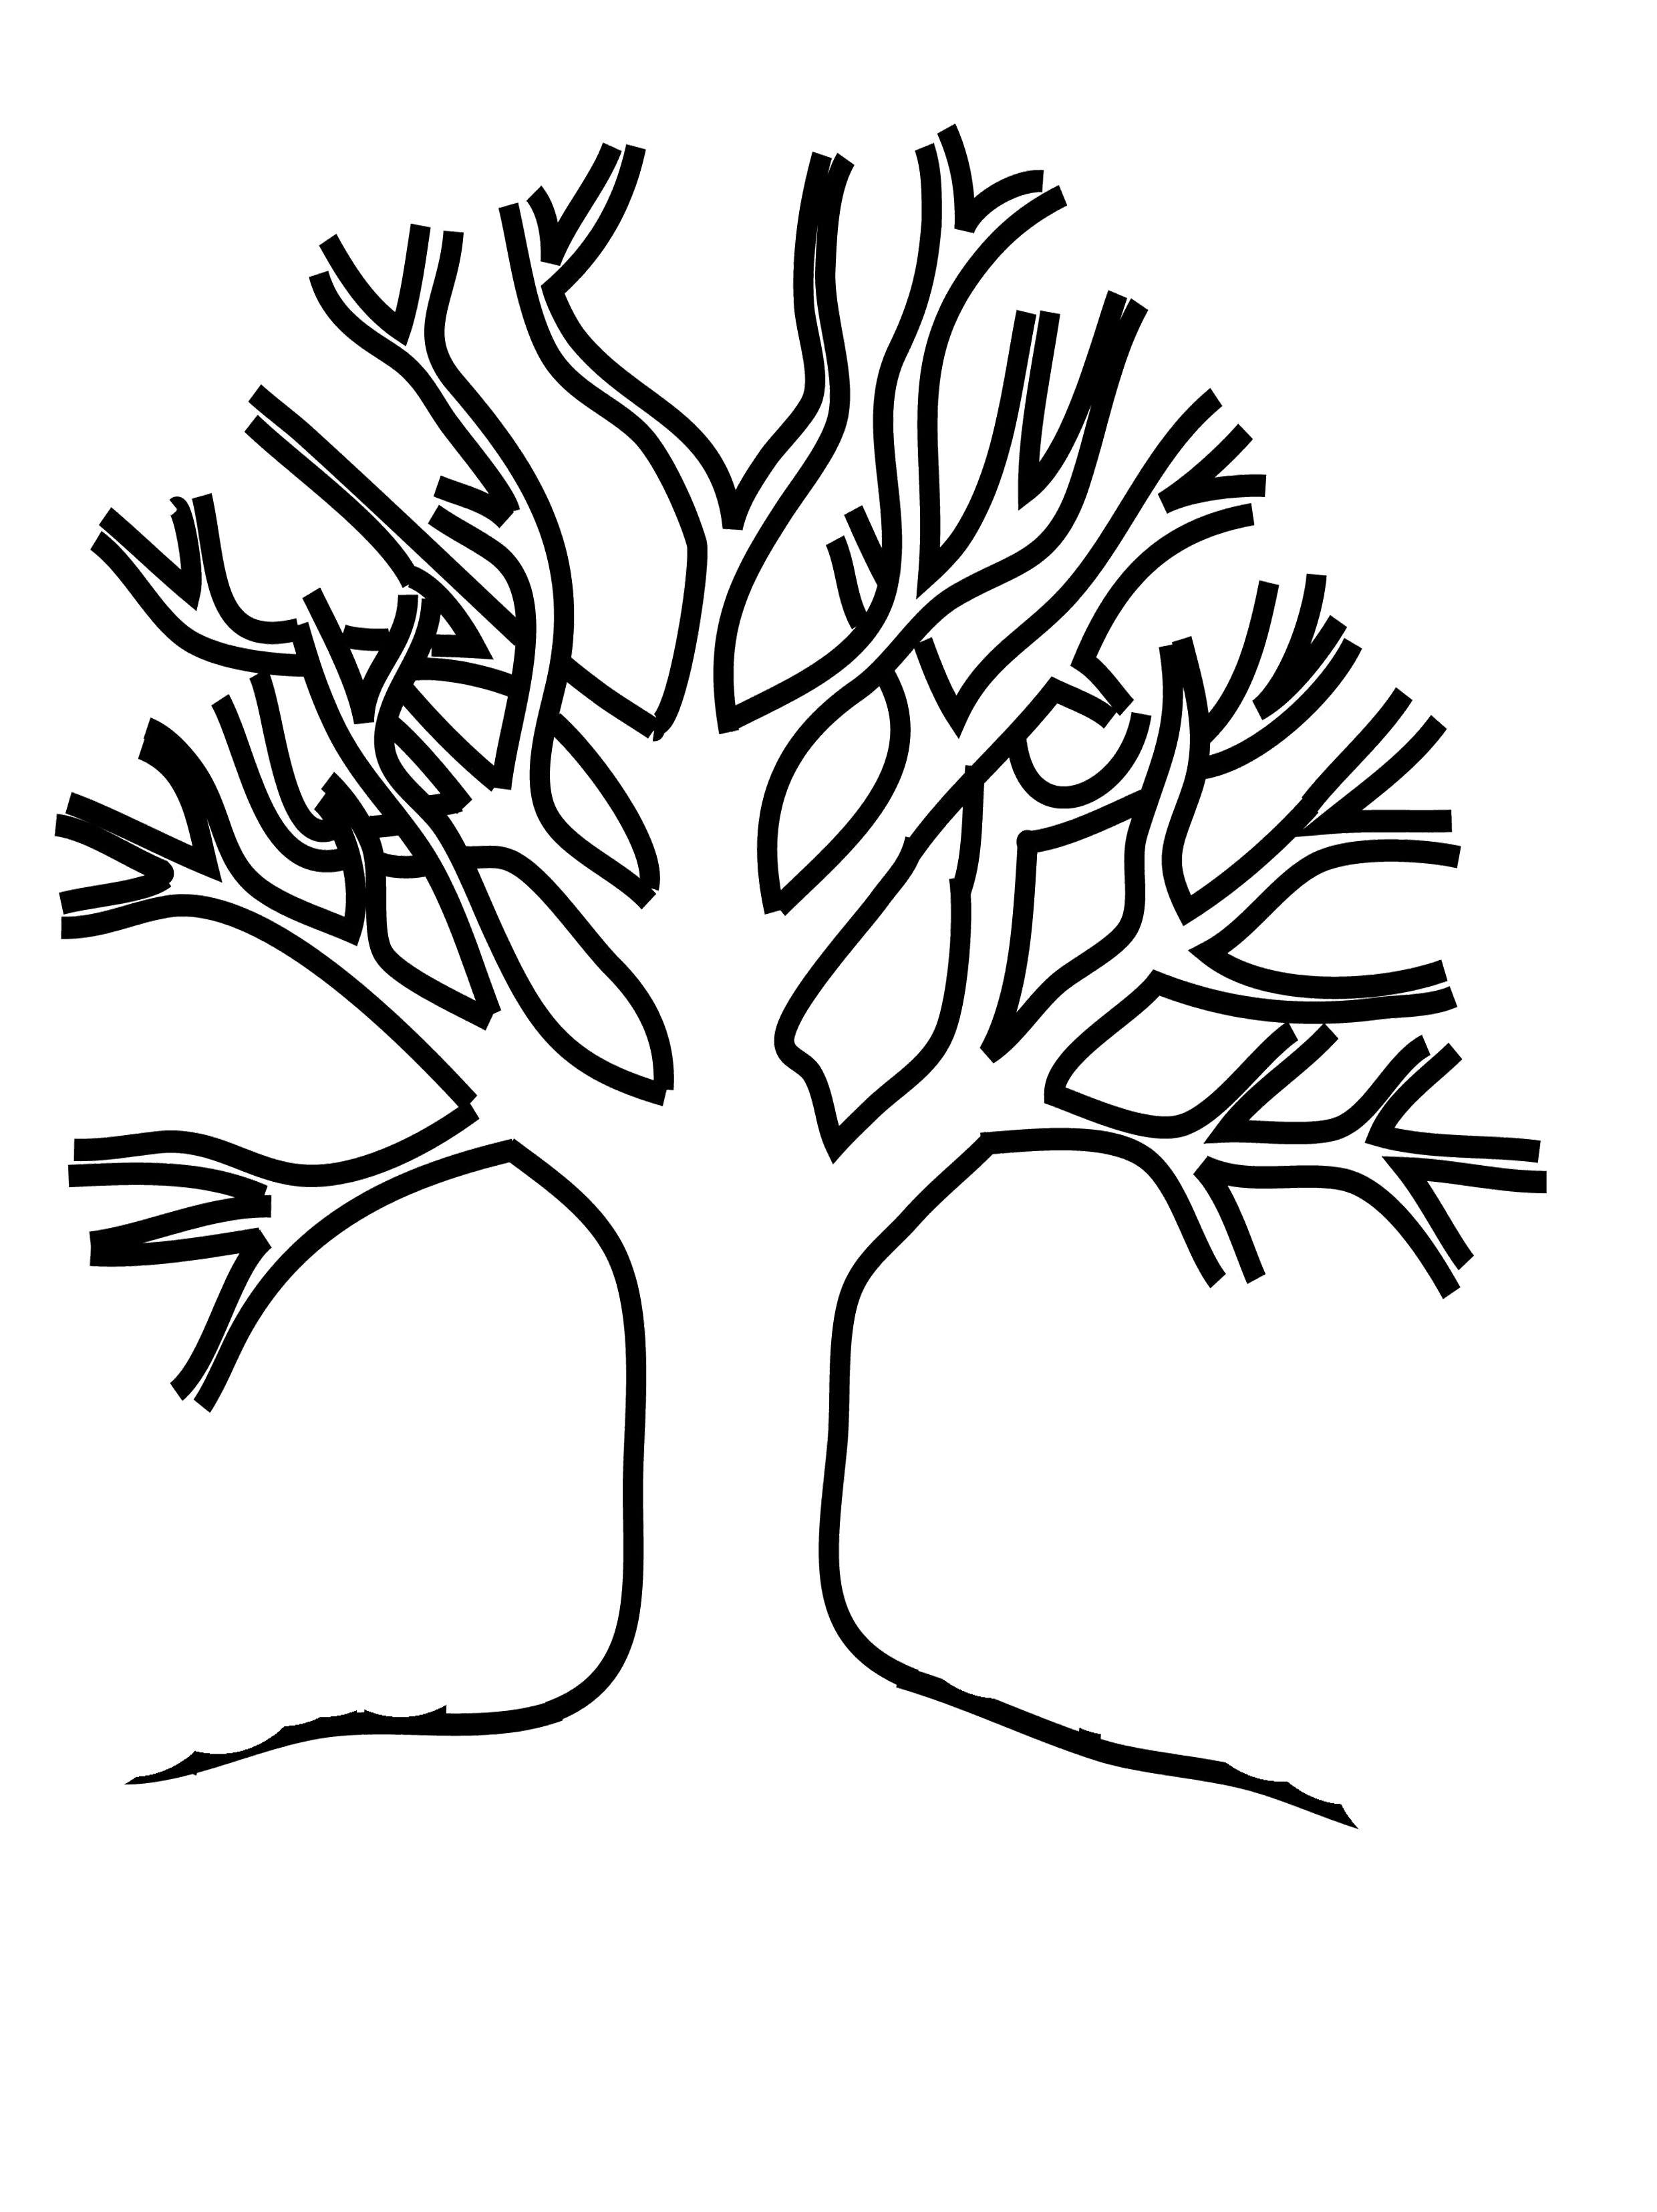 wiringpisetup without root